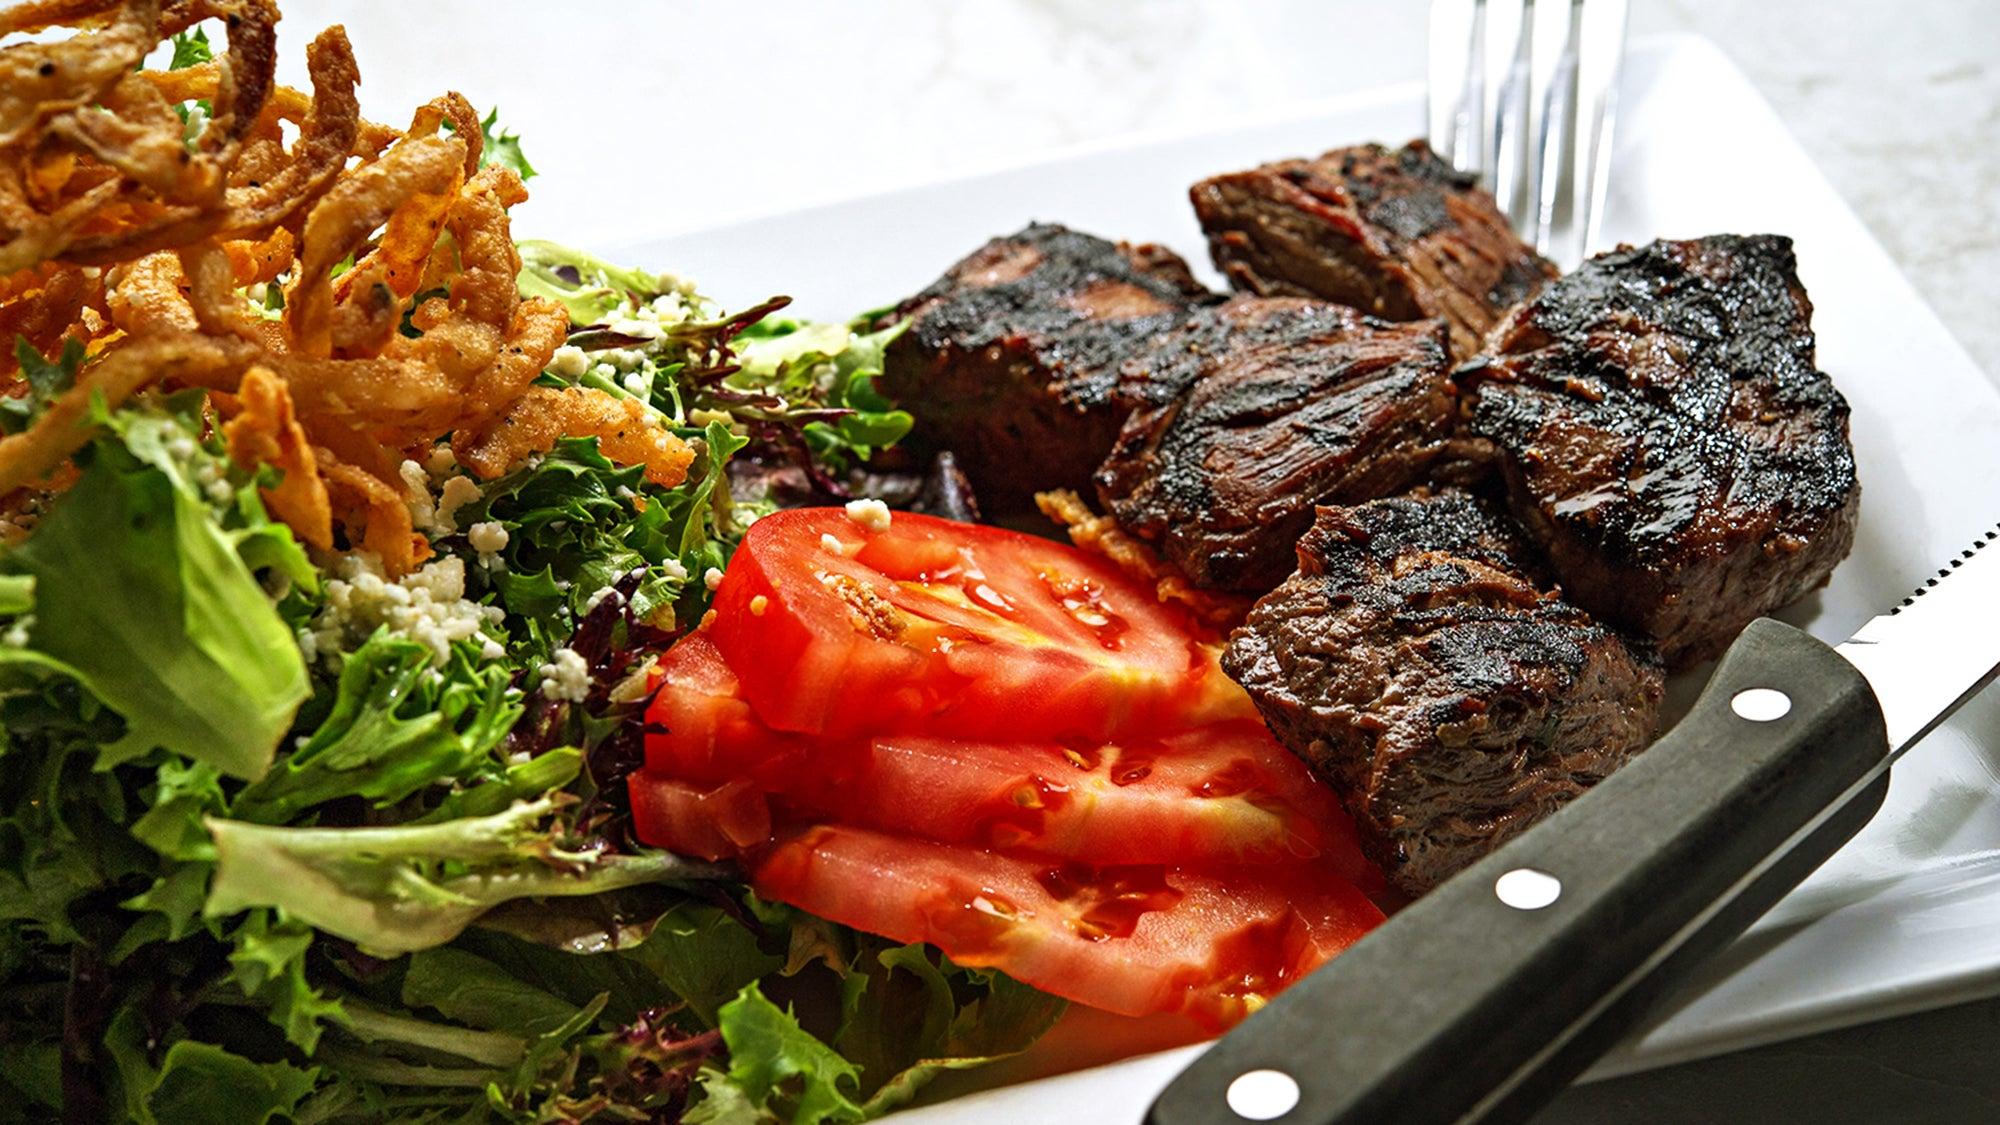 Steak salad at MJ O'Connor's